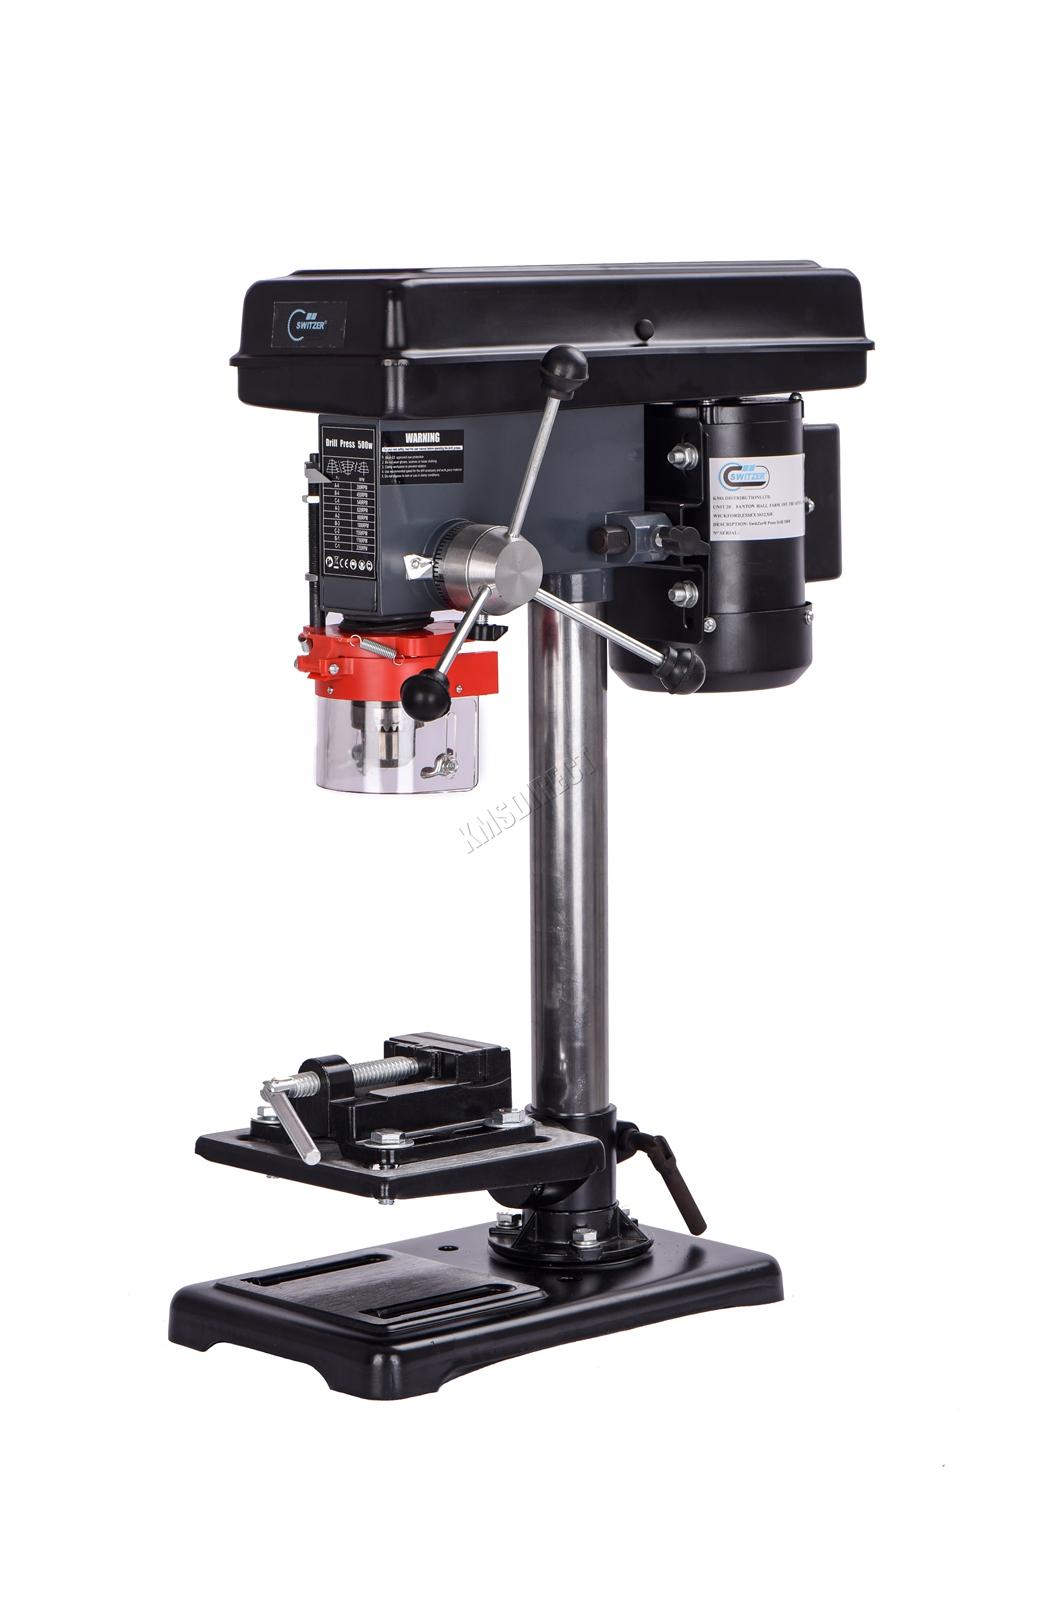 Switzer pilier Presse Perceuse Bench Top Table Stand 500 W 16 mm Banc de Travail Vitesse 9